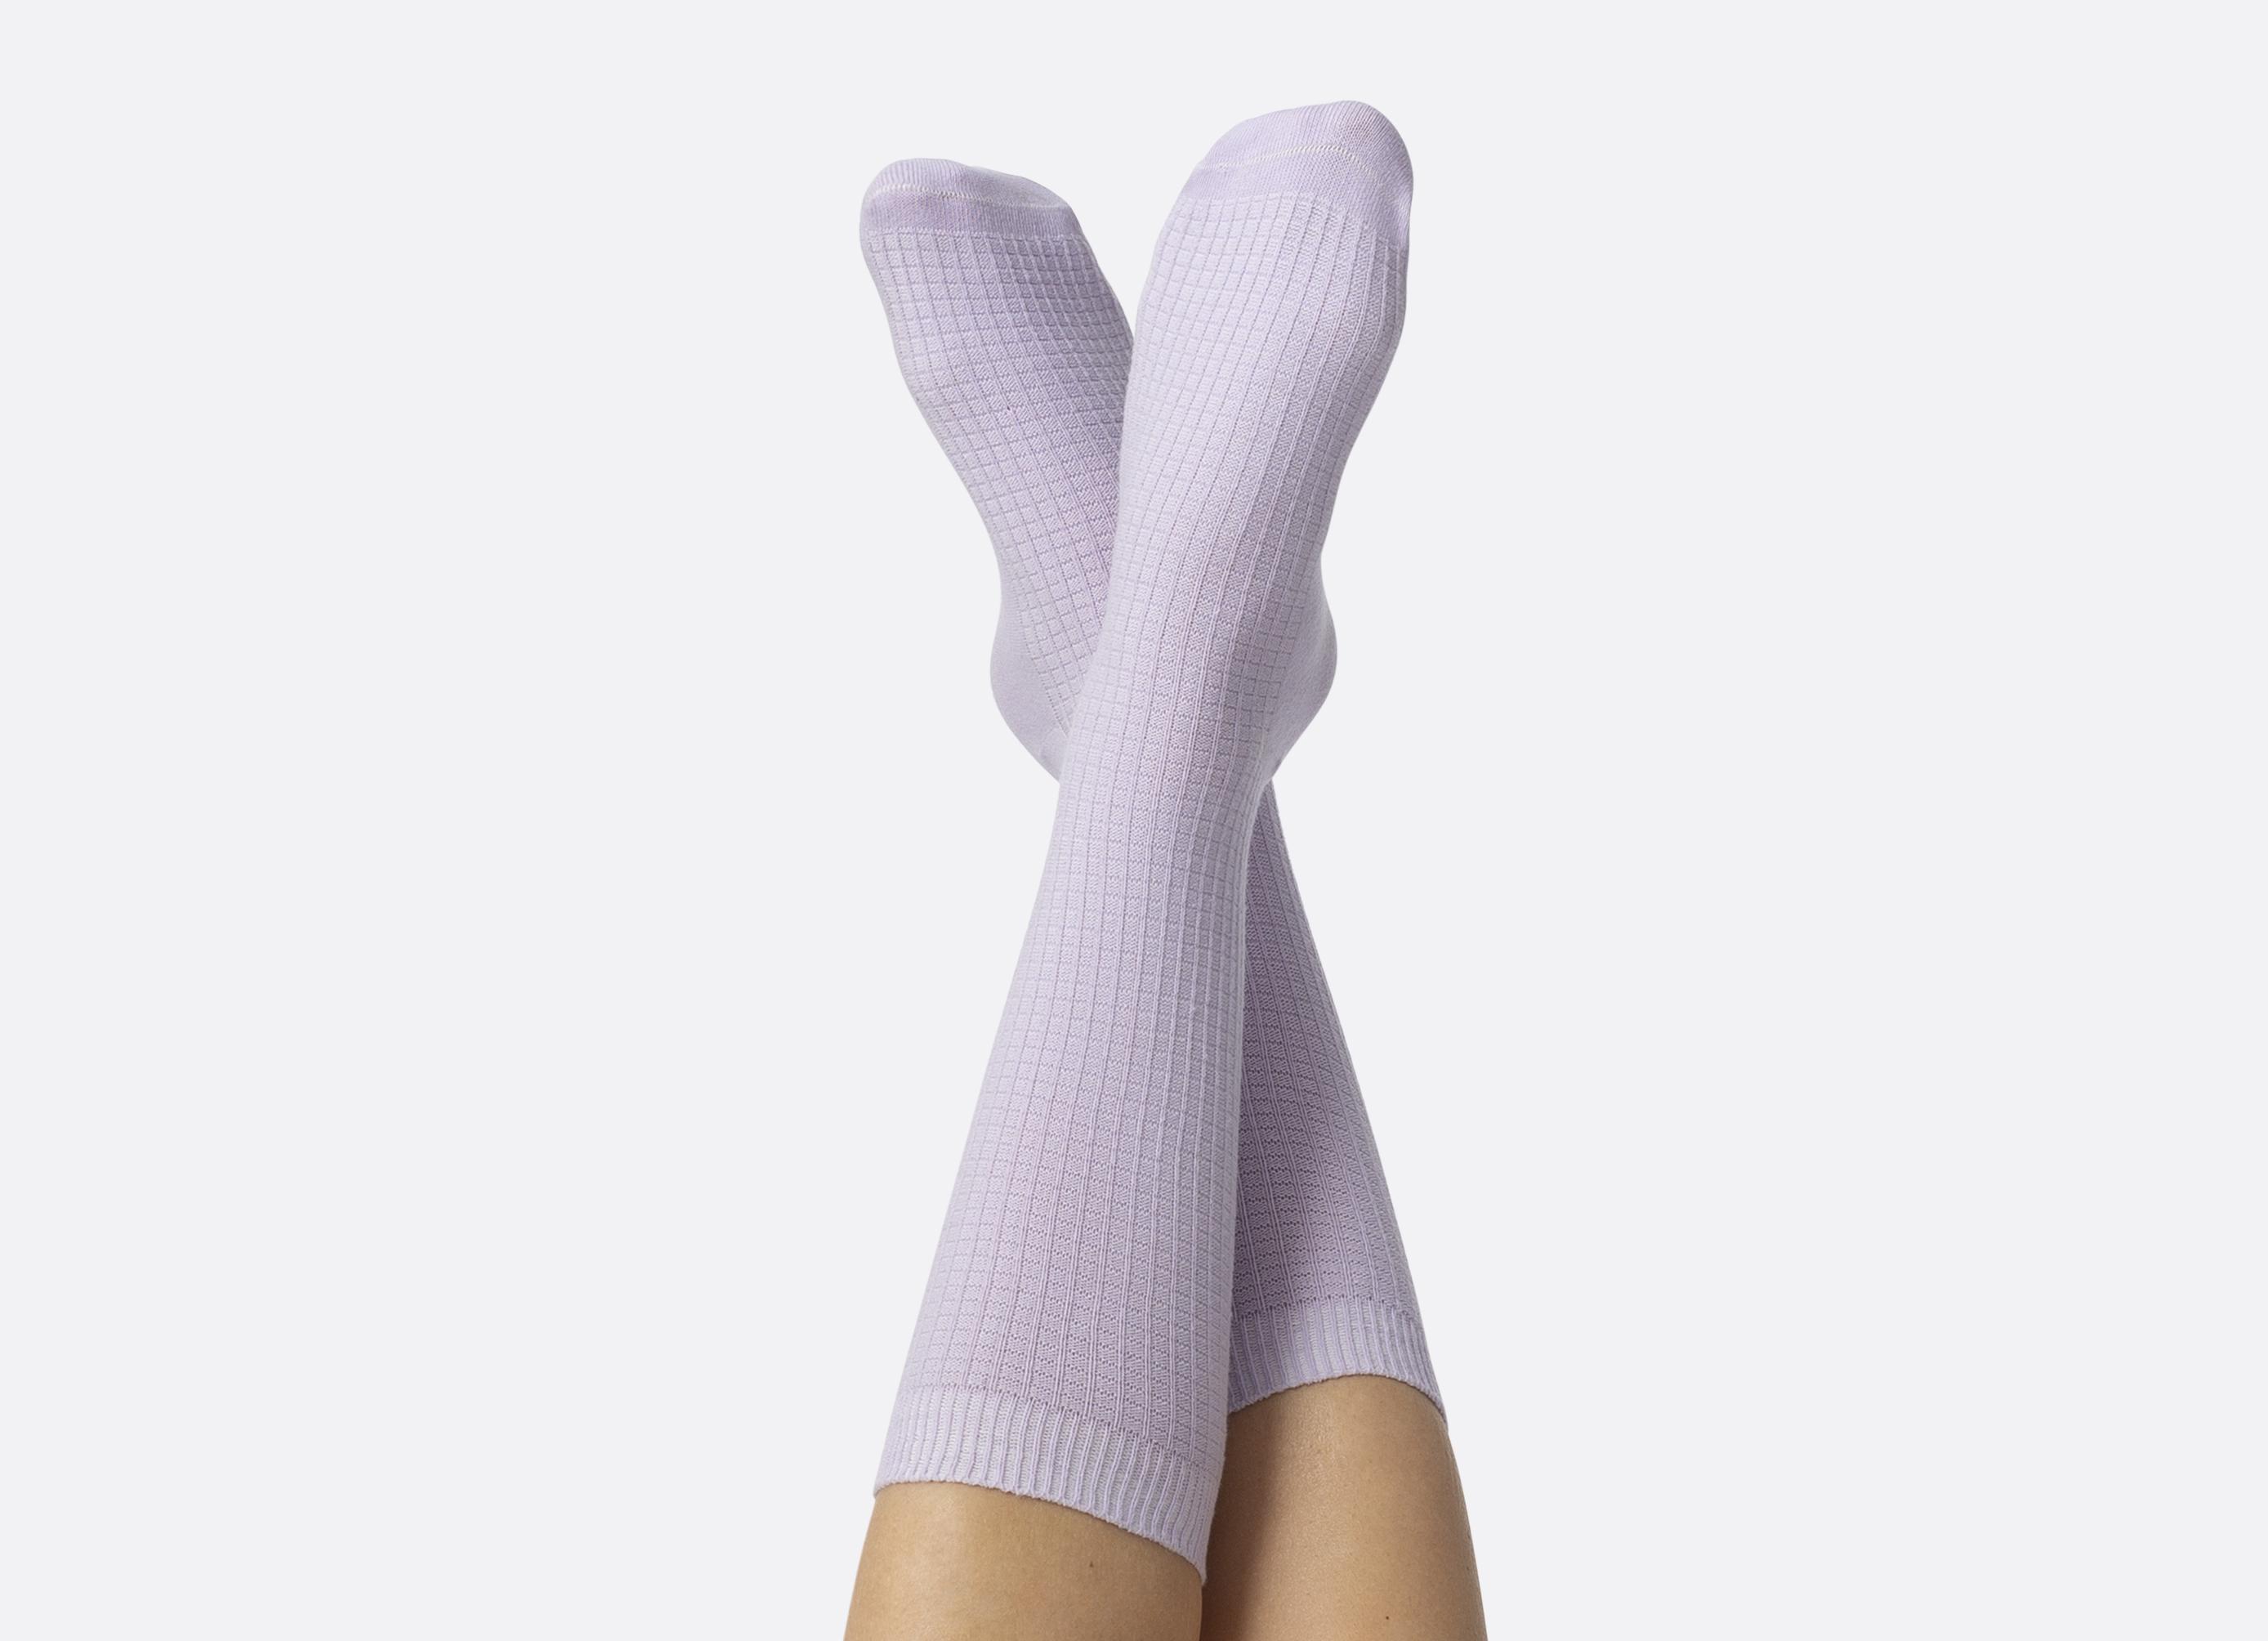 Doiy Yoga Mat strømper, lilla